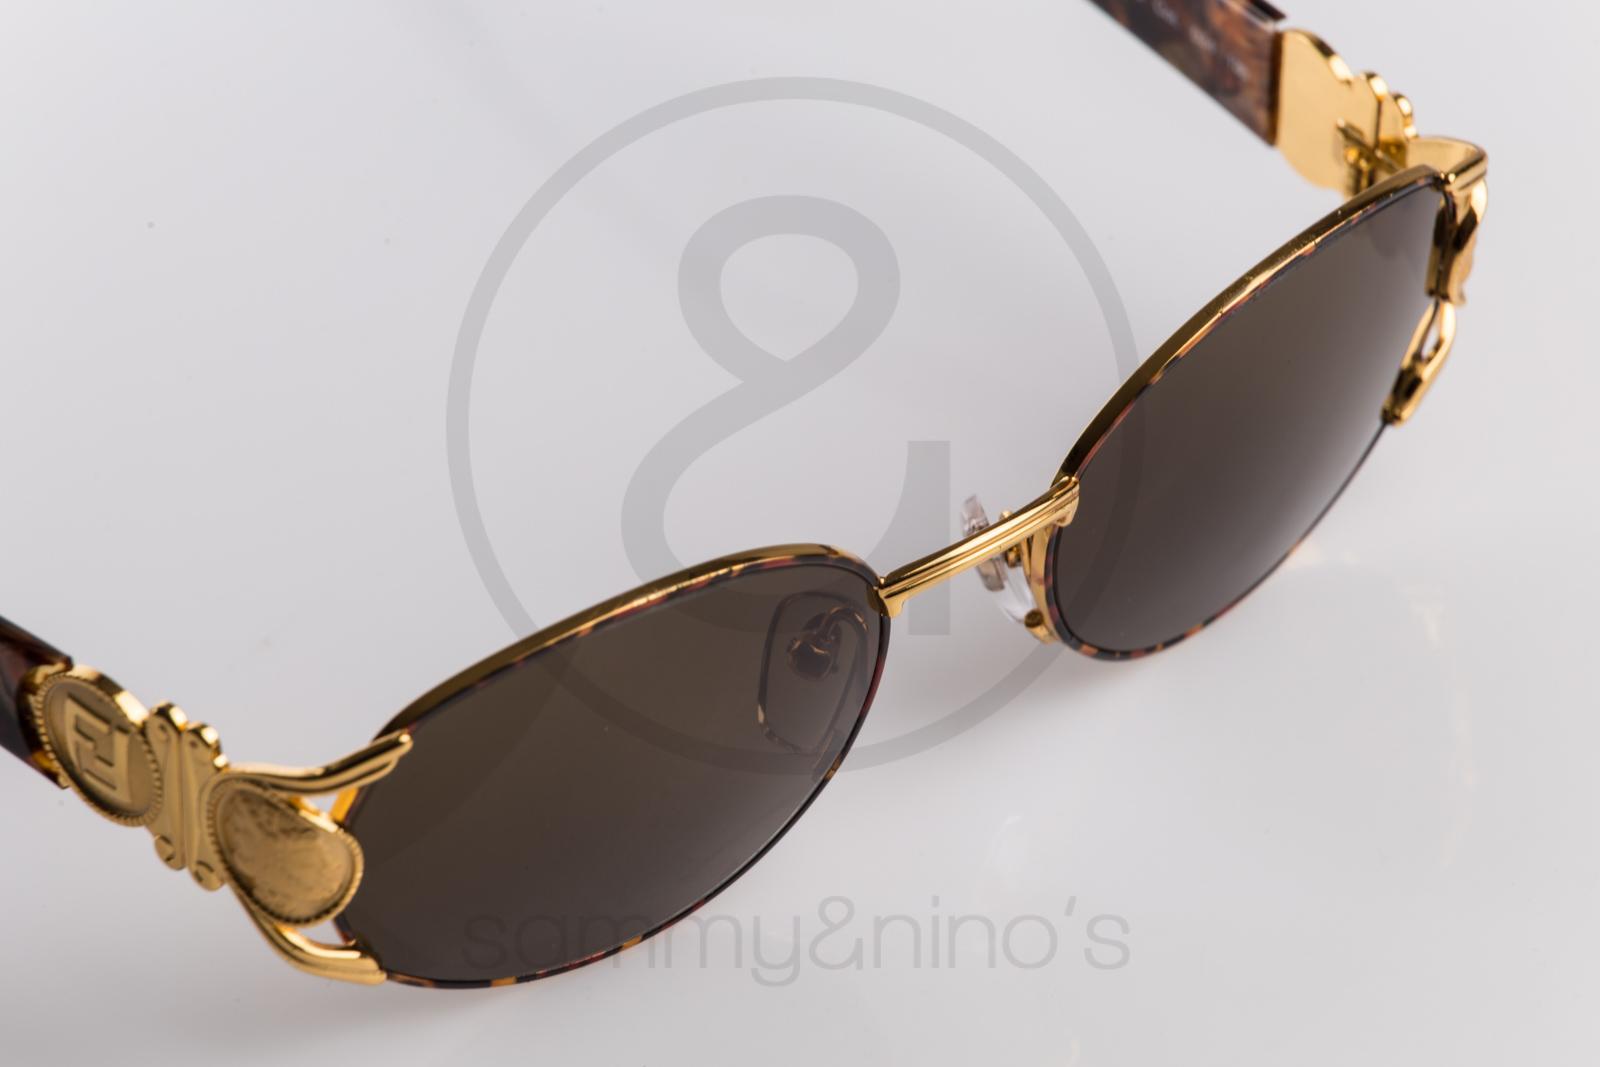 667bcd66e3 Vintage Fendi Sunglasses Mens